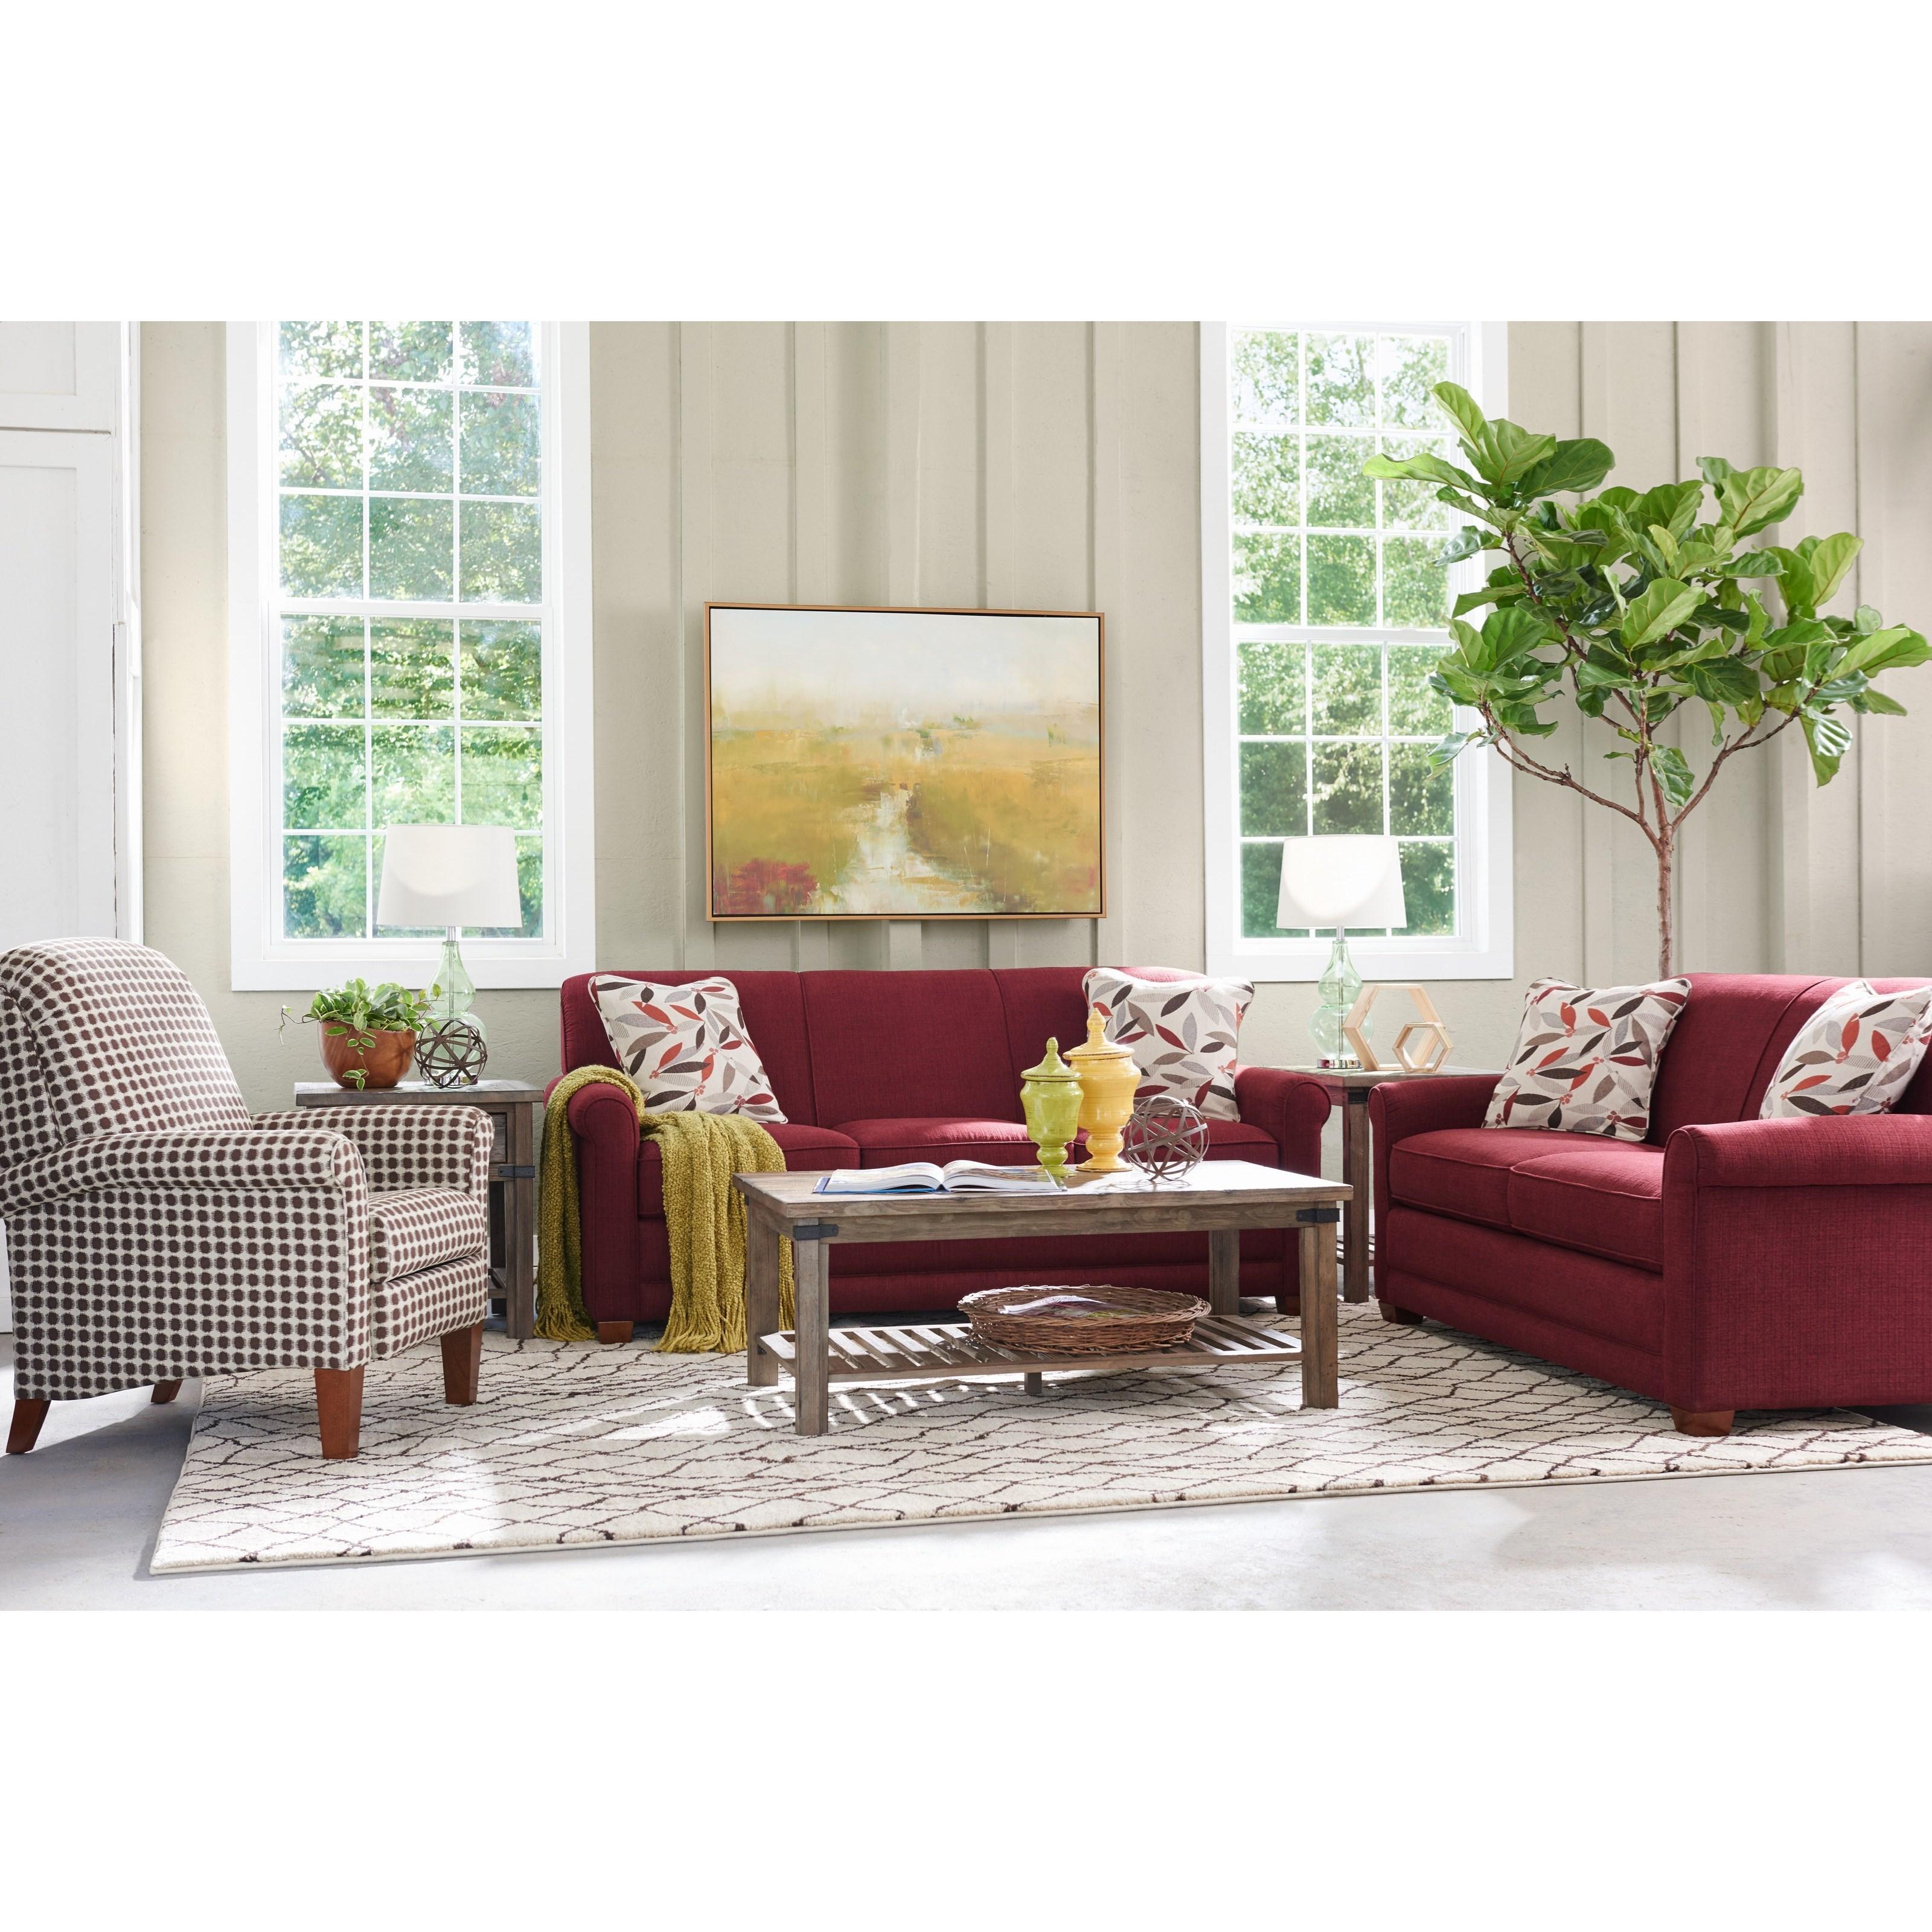 Amanda Living Room Group by La-Z-Boy at Houston's Yuma Furniture